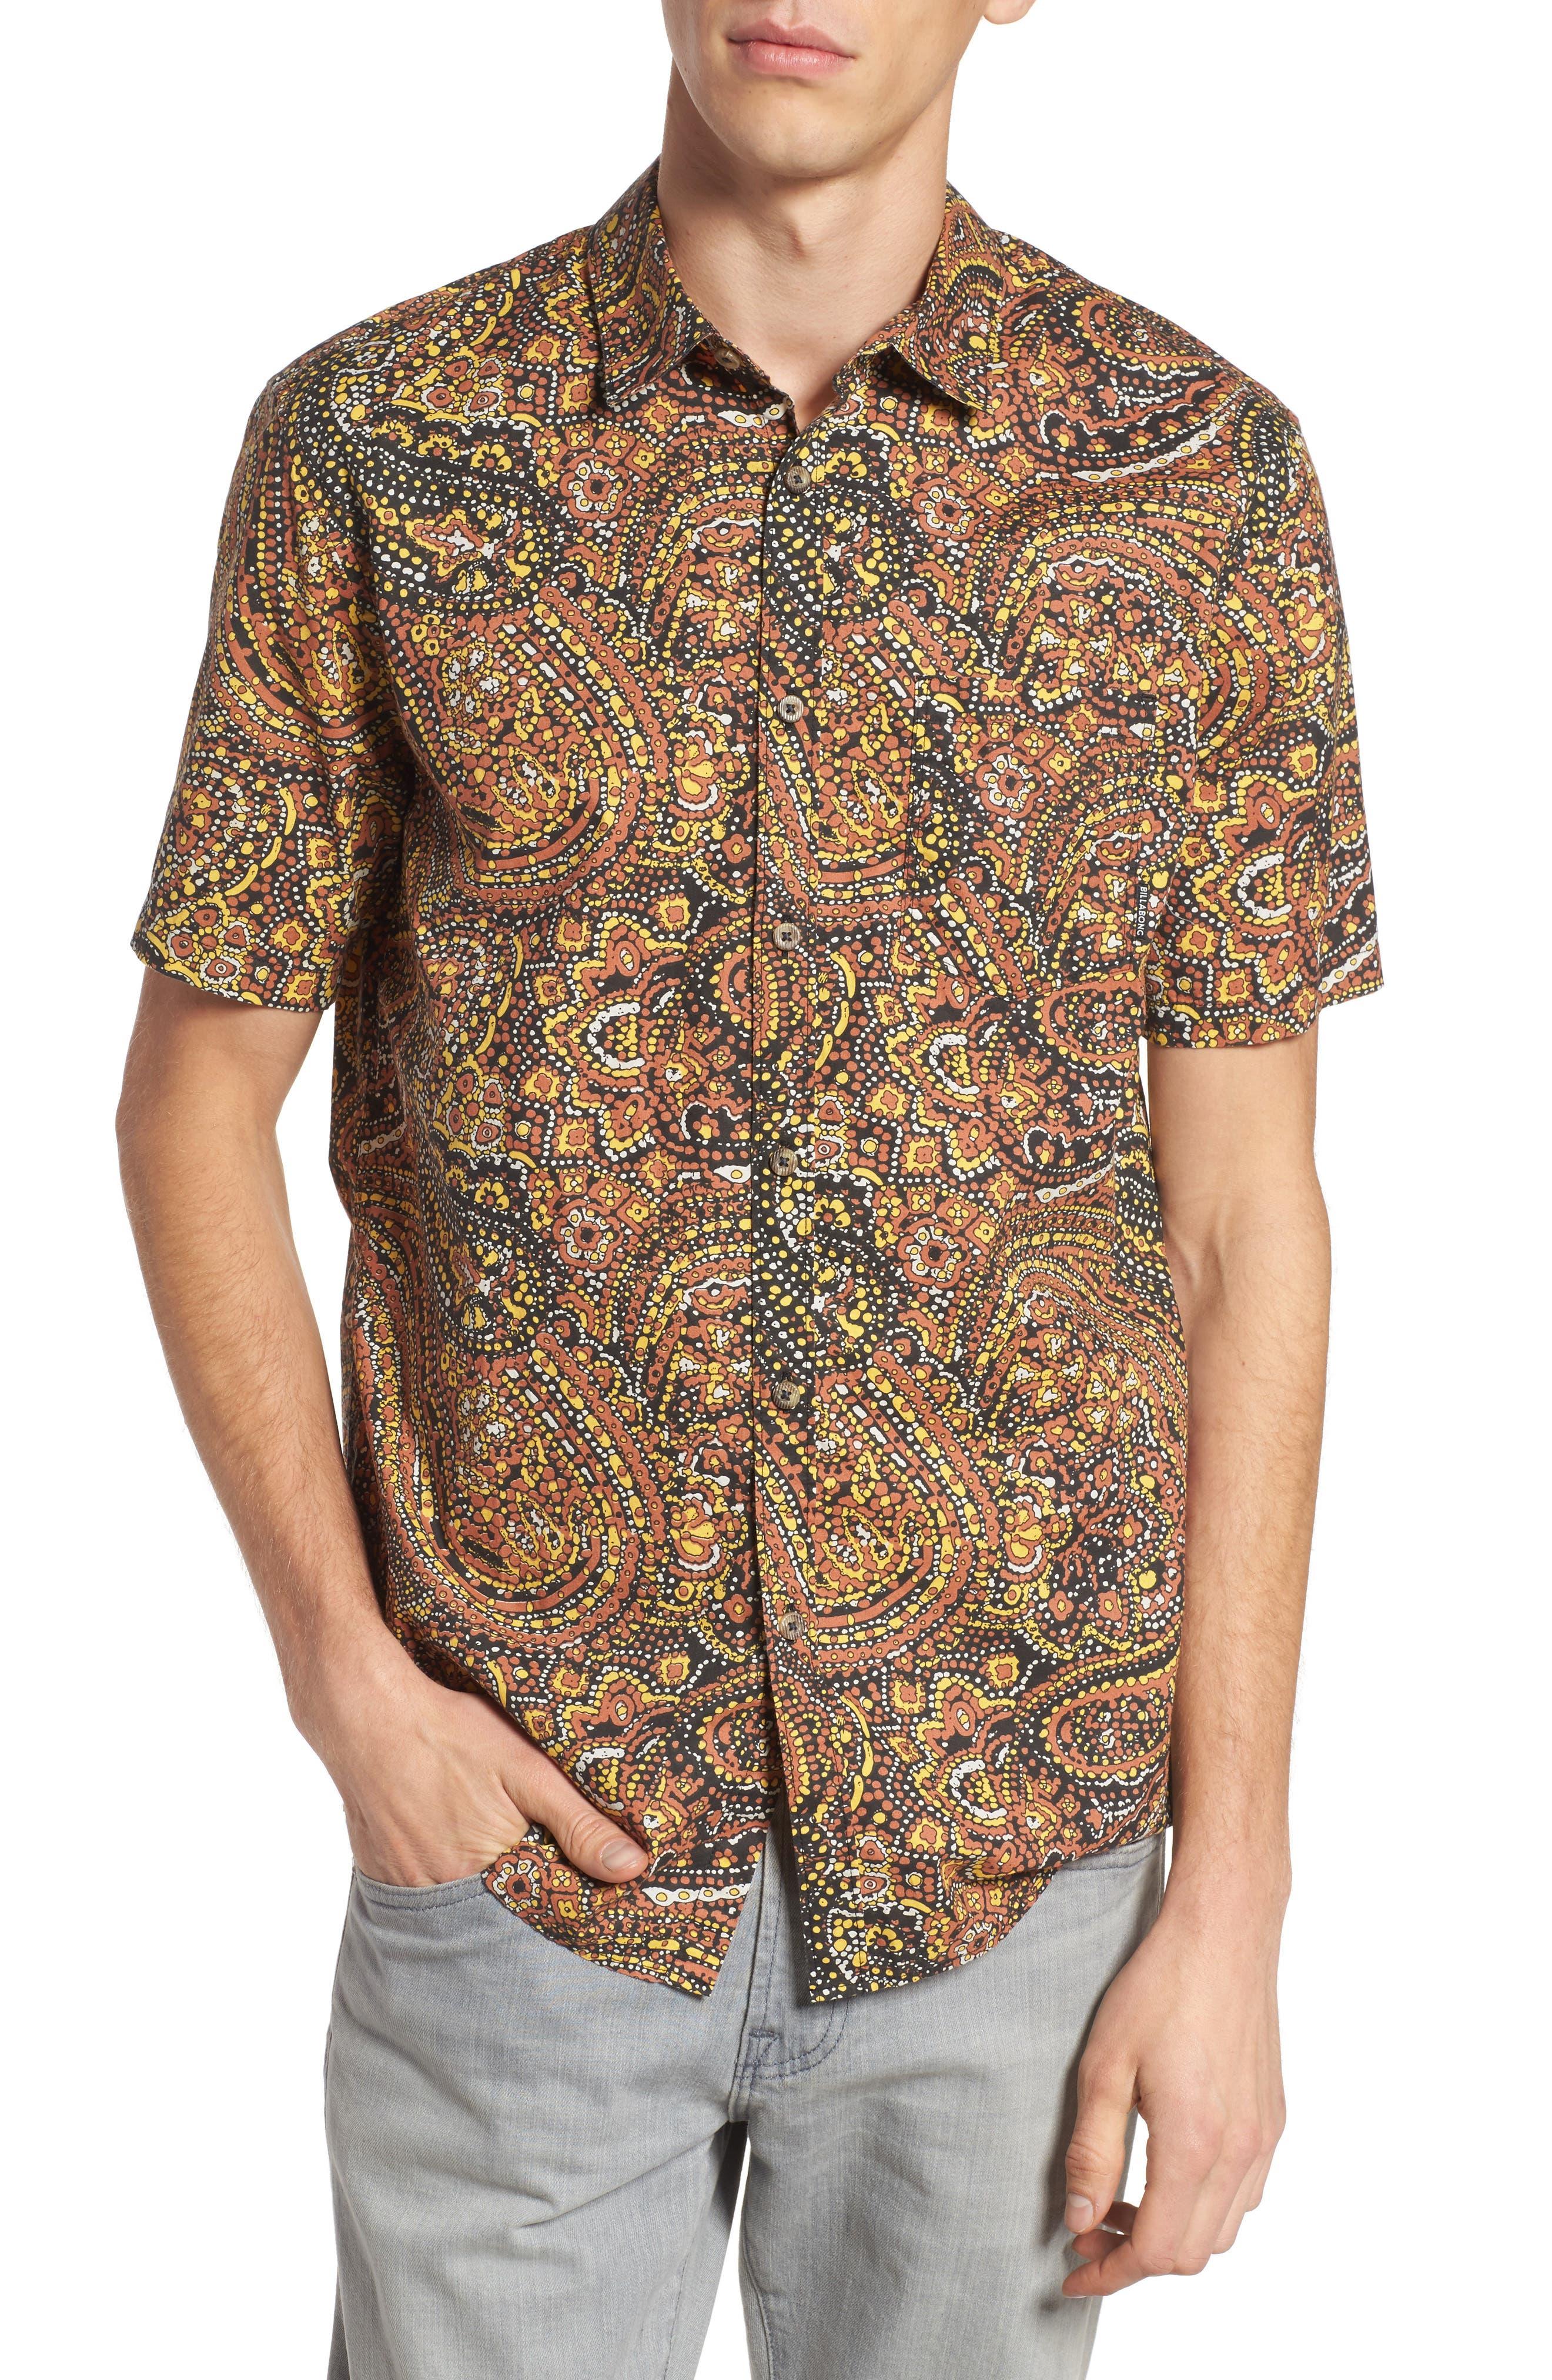 Alternate Image 1 Selected - Billabong Sundays Woven Shirt